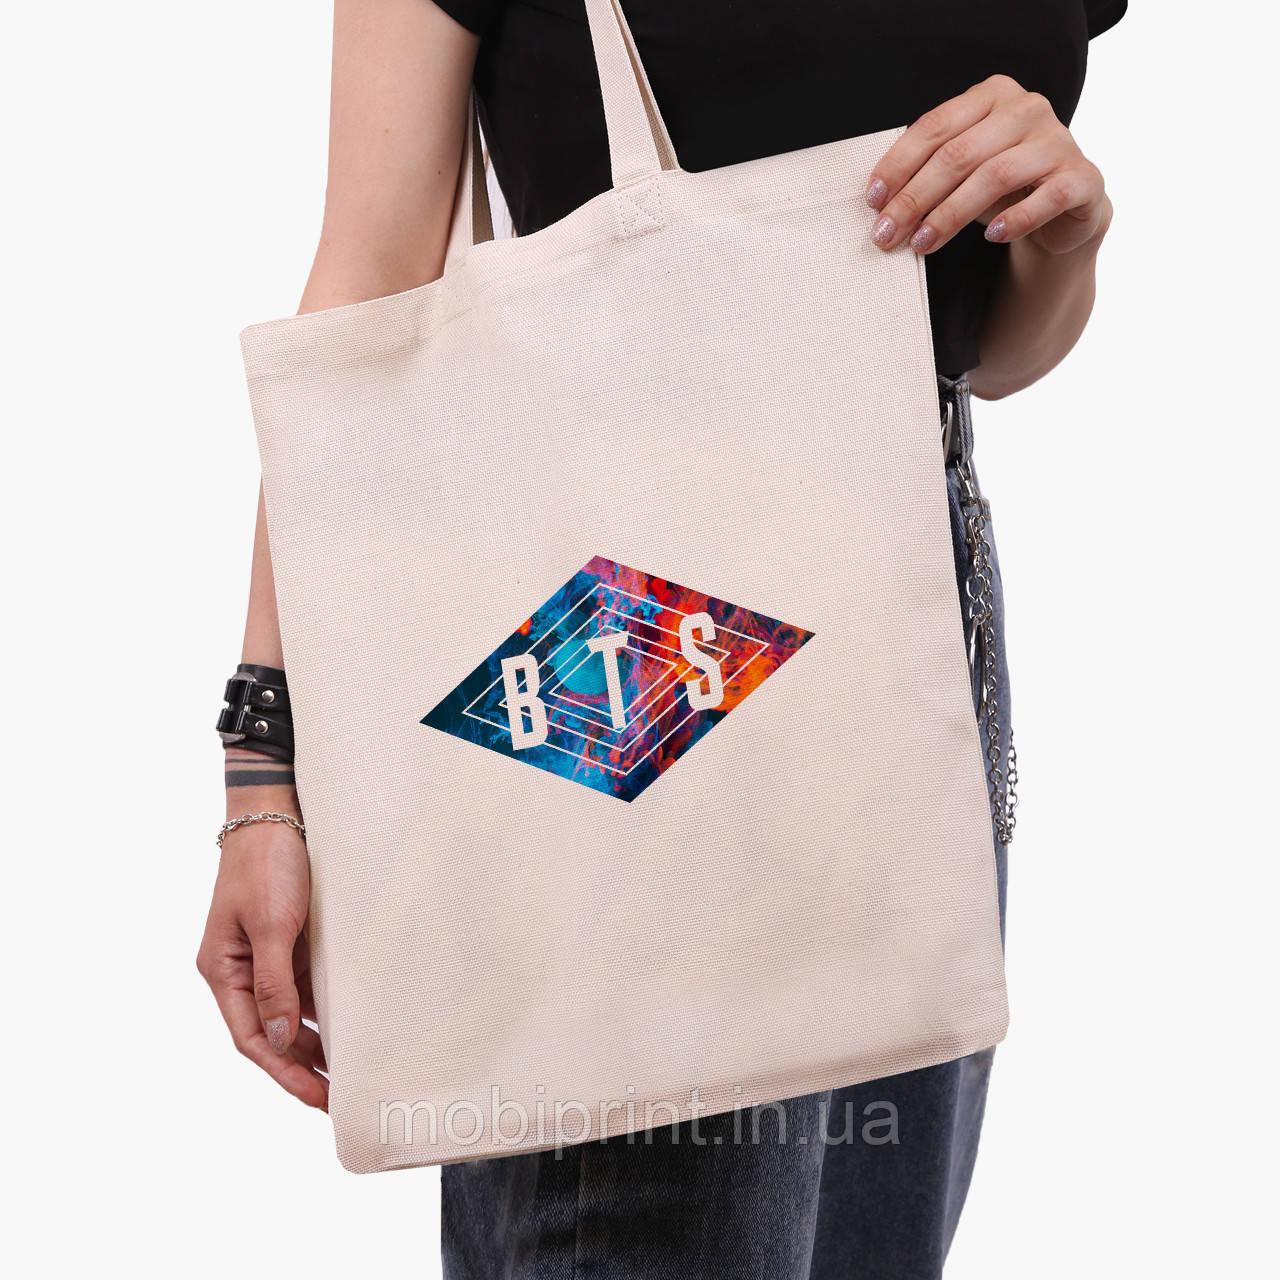 Еко сумка шоппер БТС (BTS) (9227-1062) екосумка шопер 41*35 см